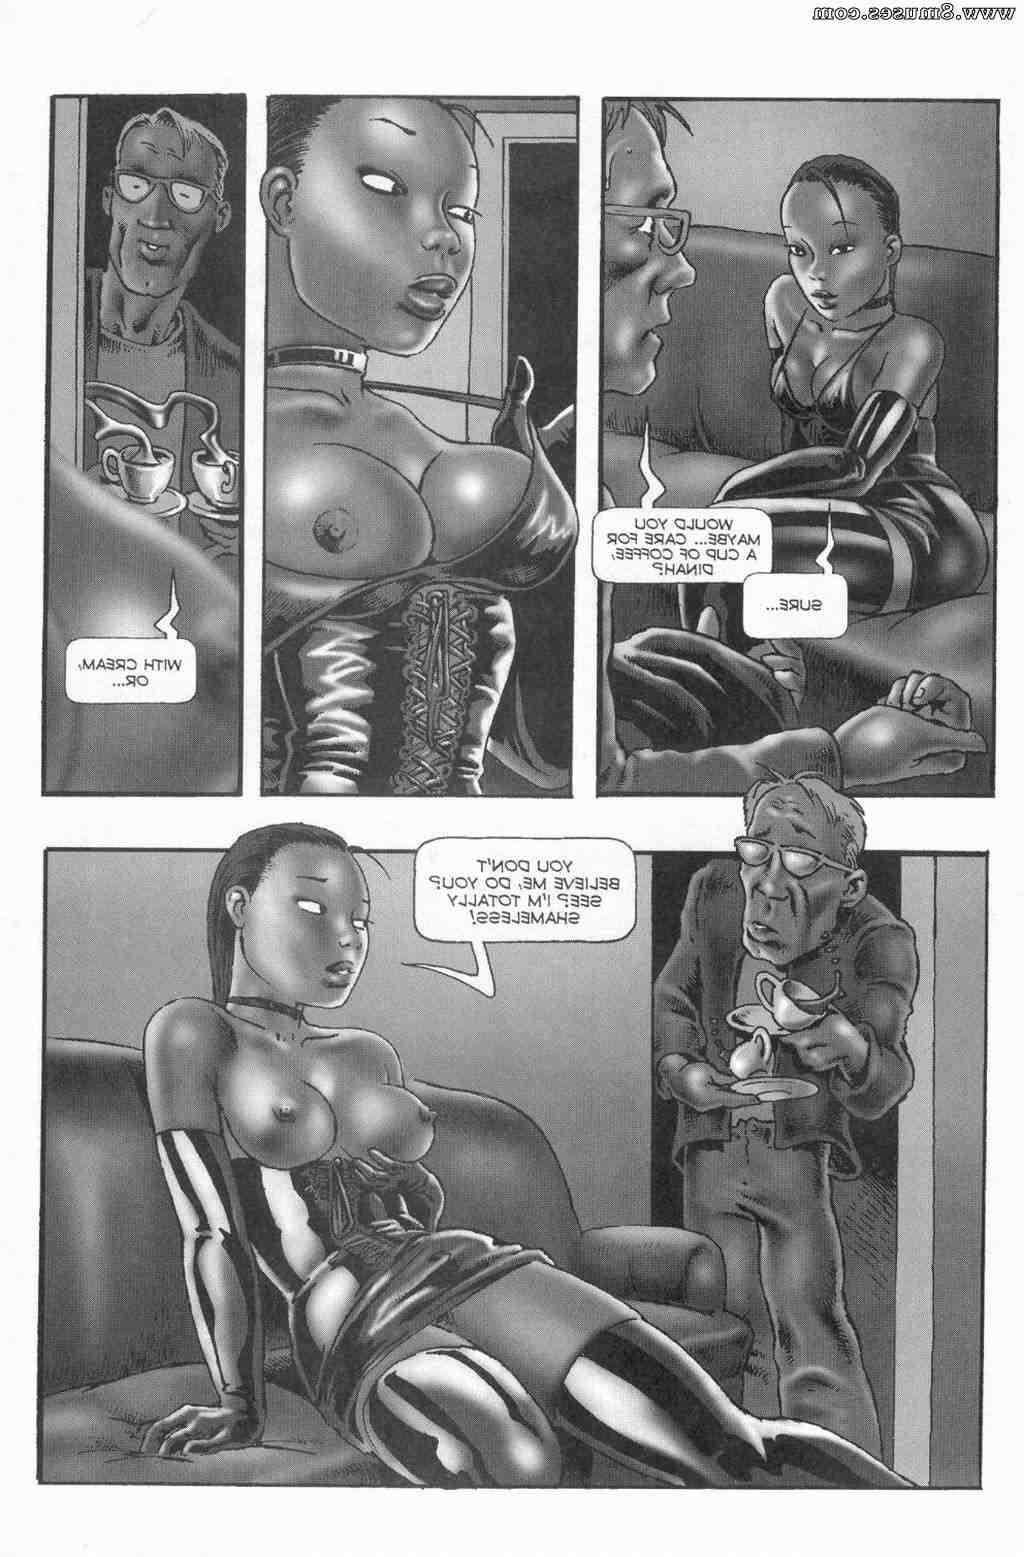 EROS-Comics/Alraune/Alraune-06 Alraune_06__8muses_-_Sex_and_Porn_Comics_7.jpg